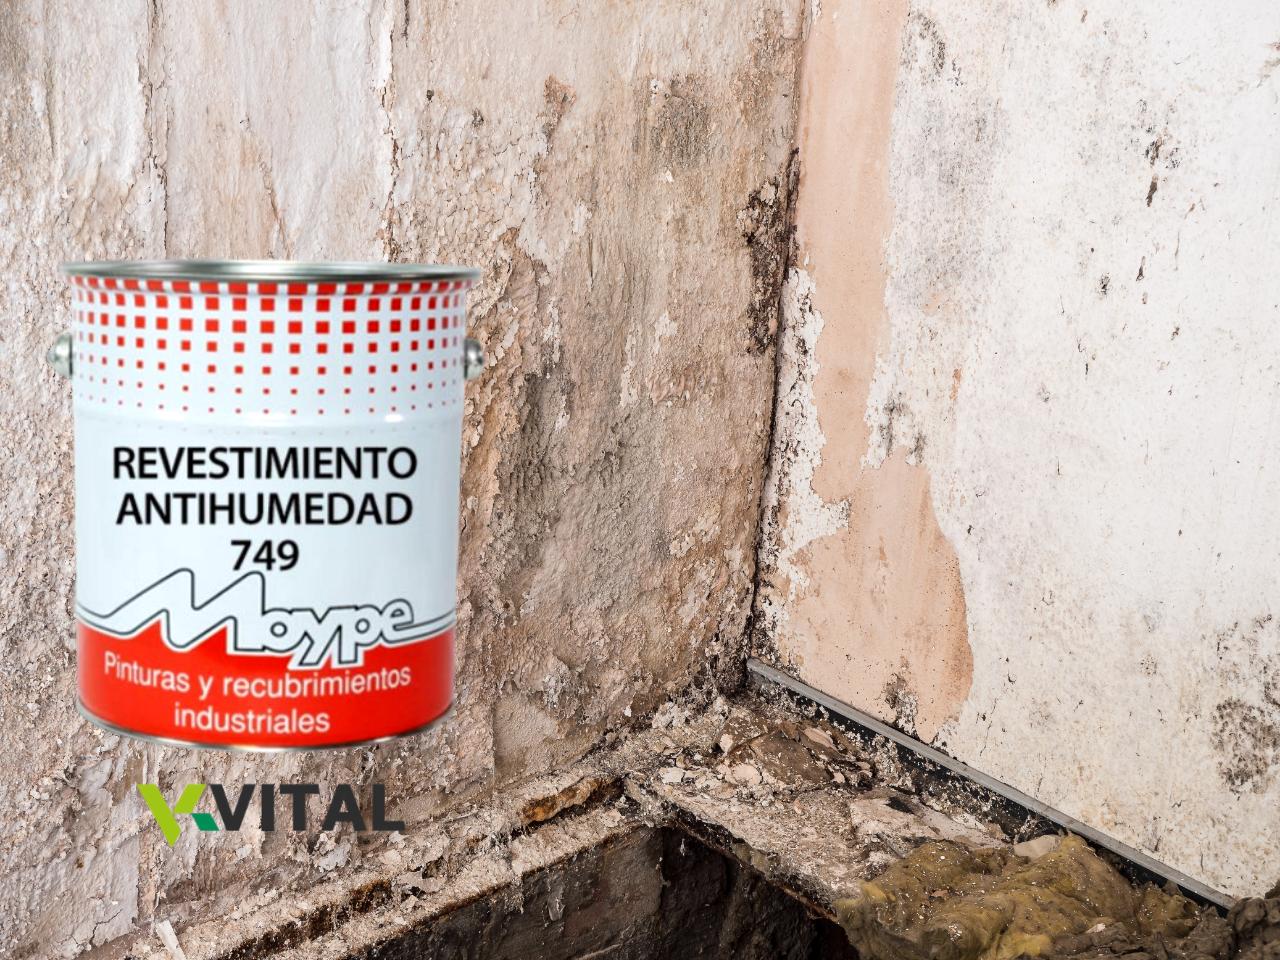 Salitrex - Anti-humidade